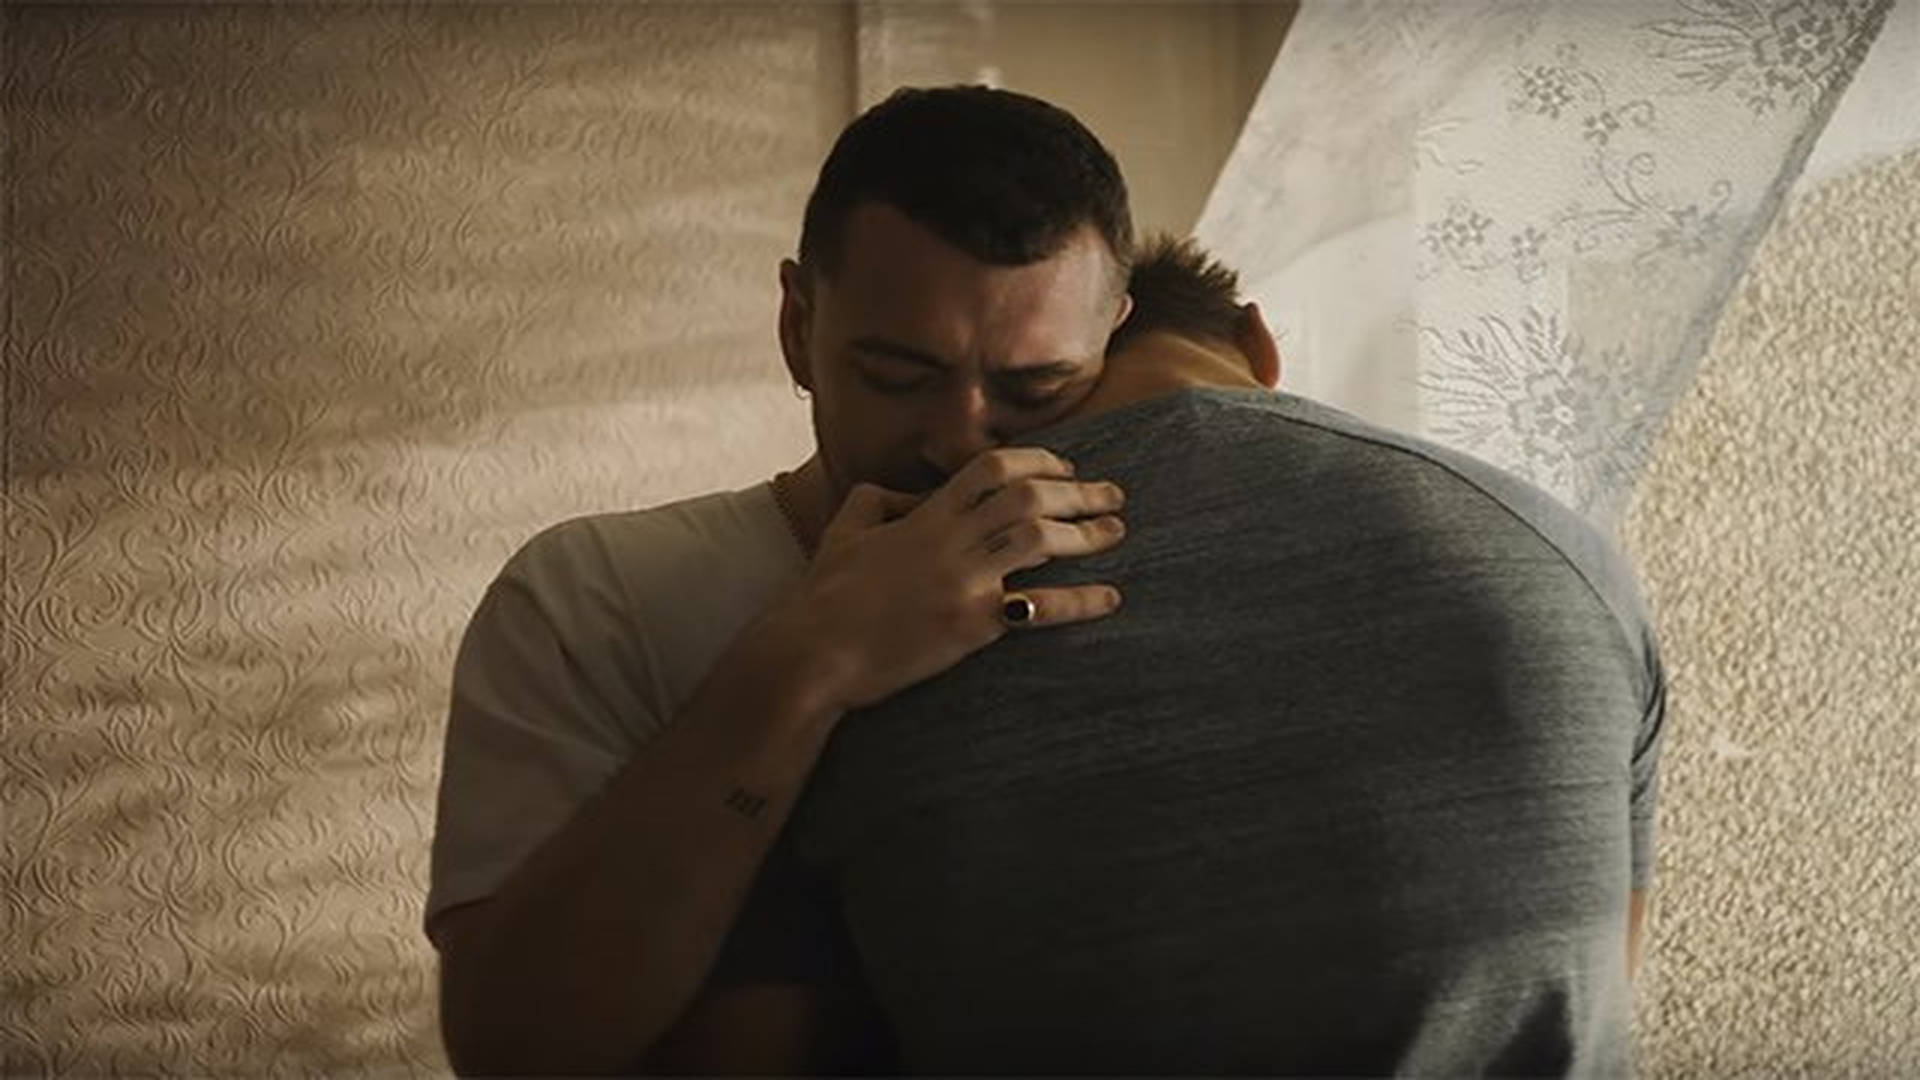 Sam-Smith-Too-Good-at-Goodbyes-Musikvideo